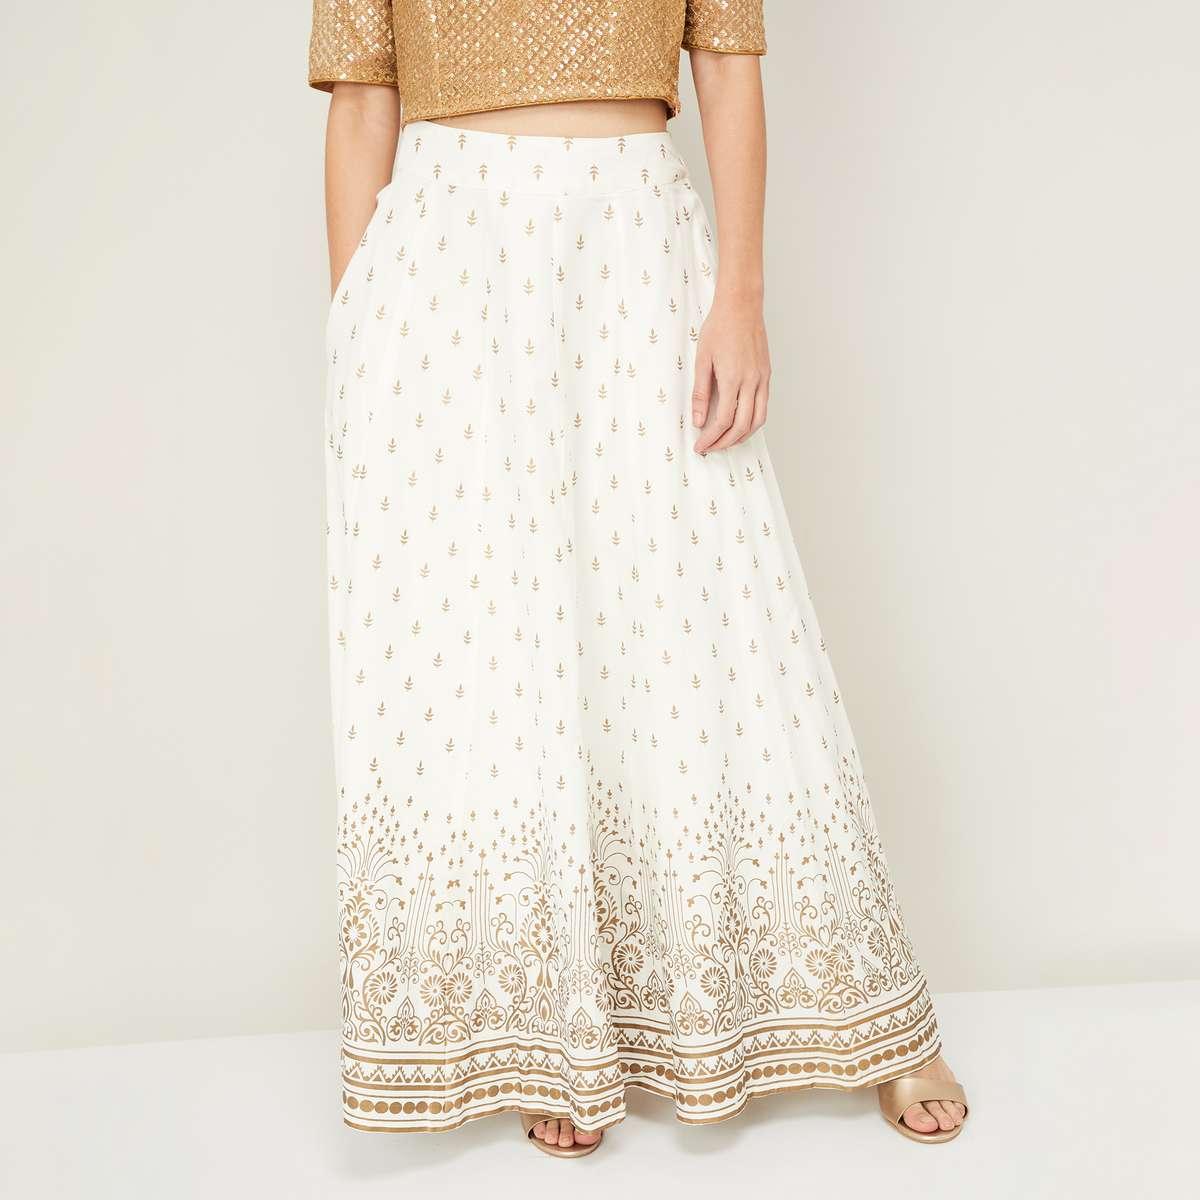 7.DE MOZA Women Printed A-Line Maxi Skirt